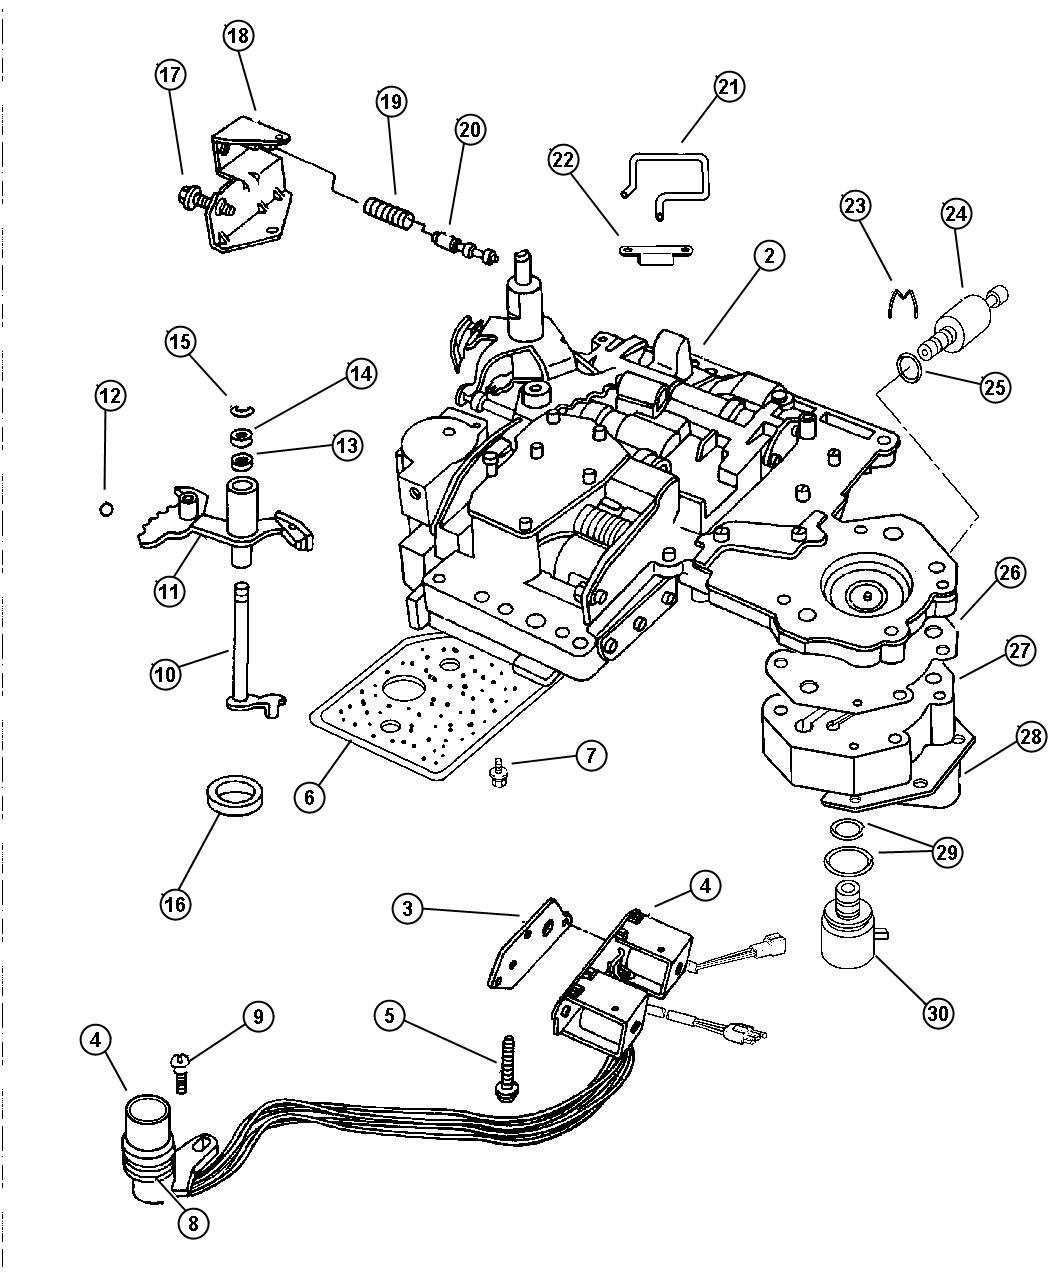 2001 ford ranger fuse box diagram additionally 03 ford ranger fuse box